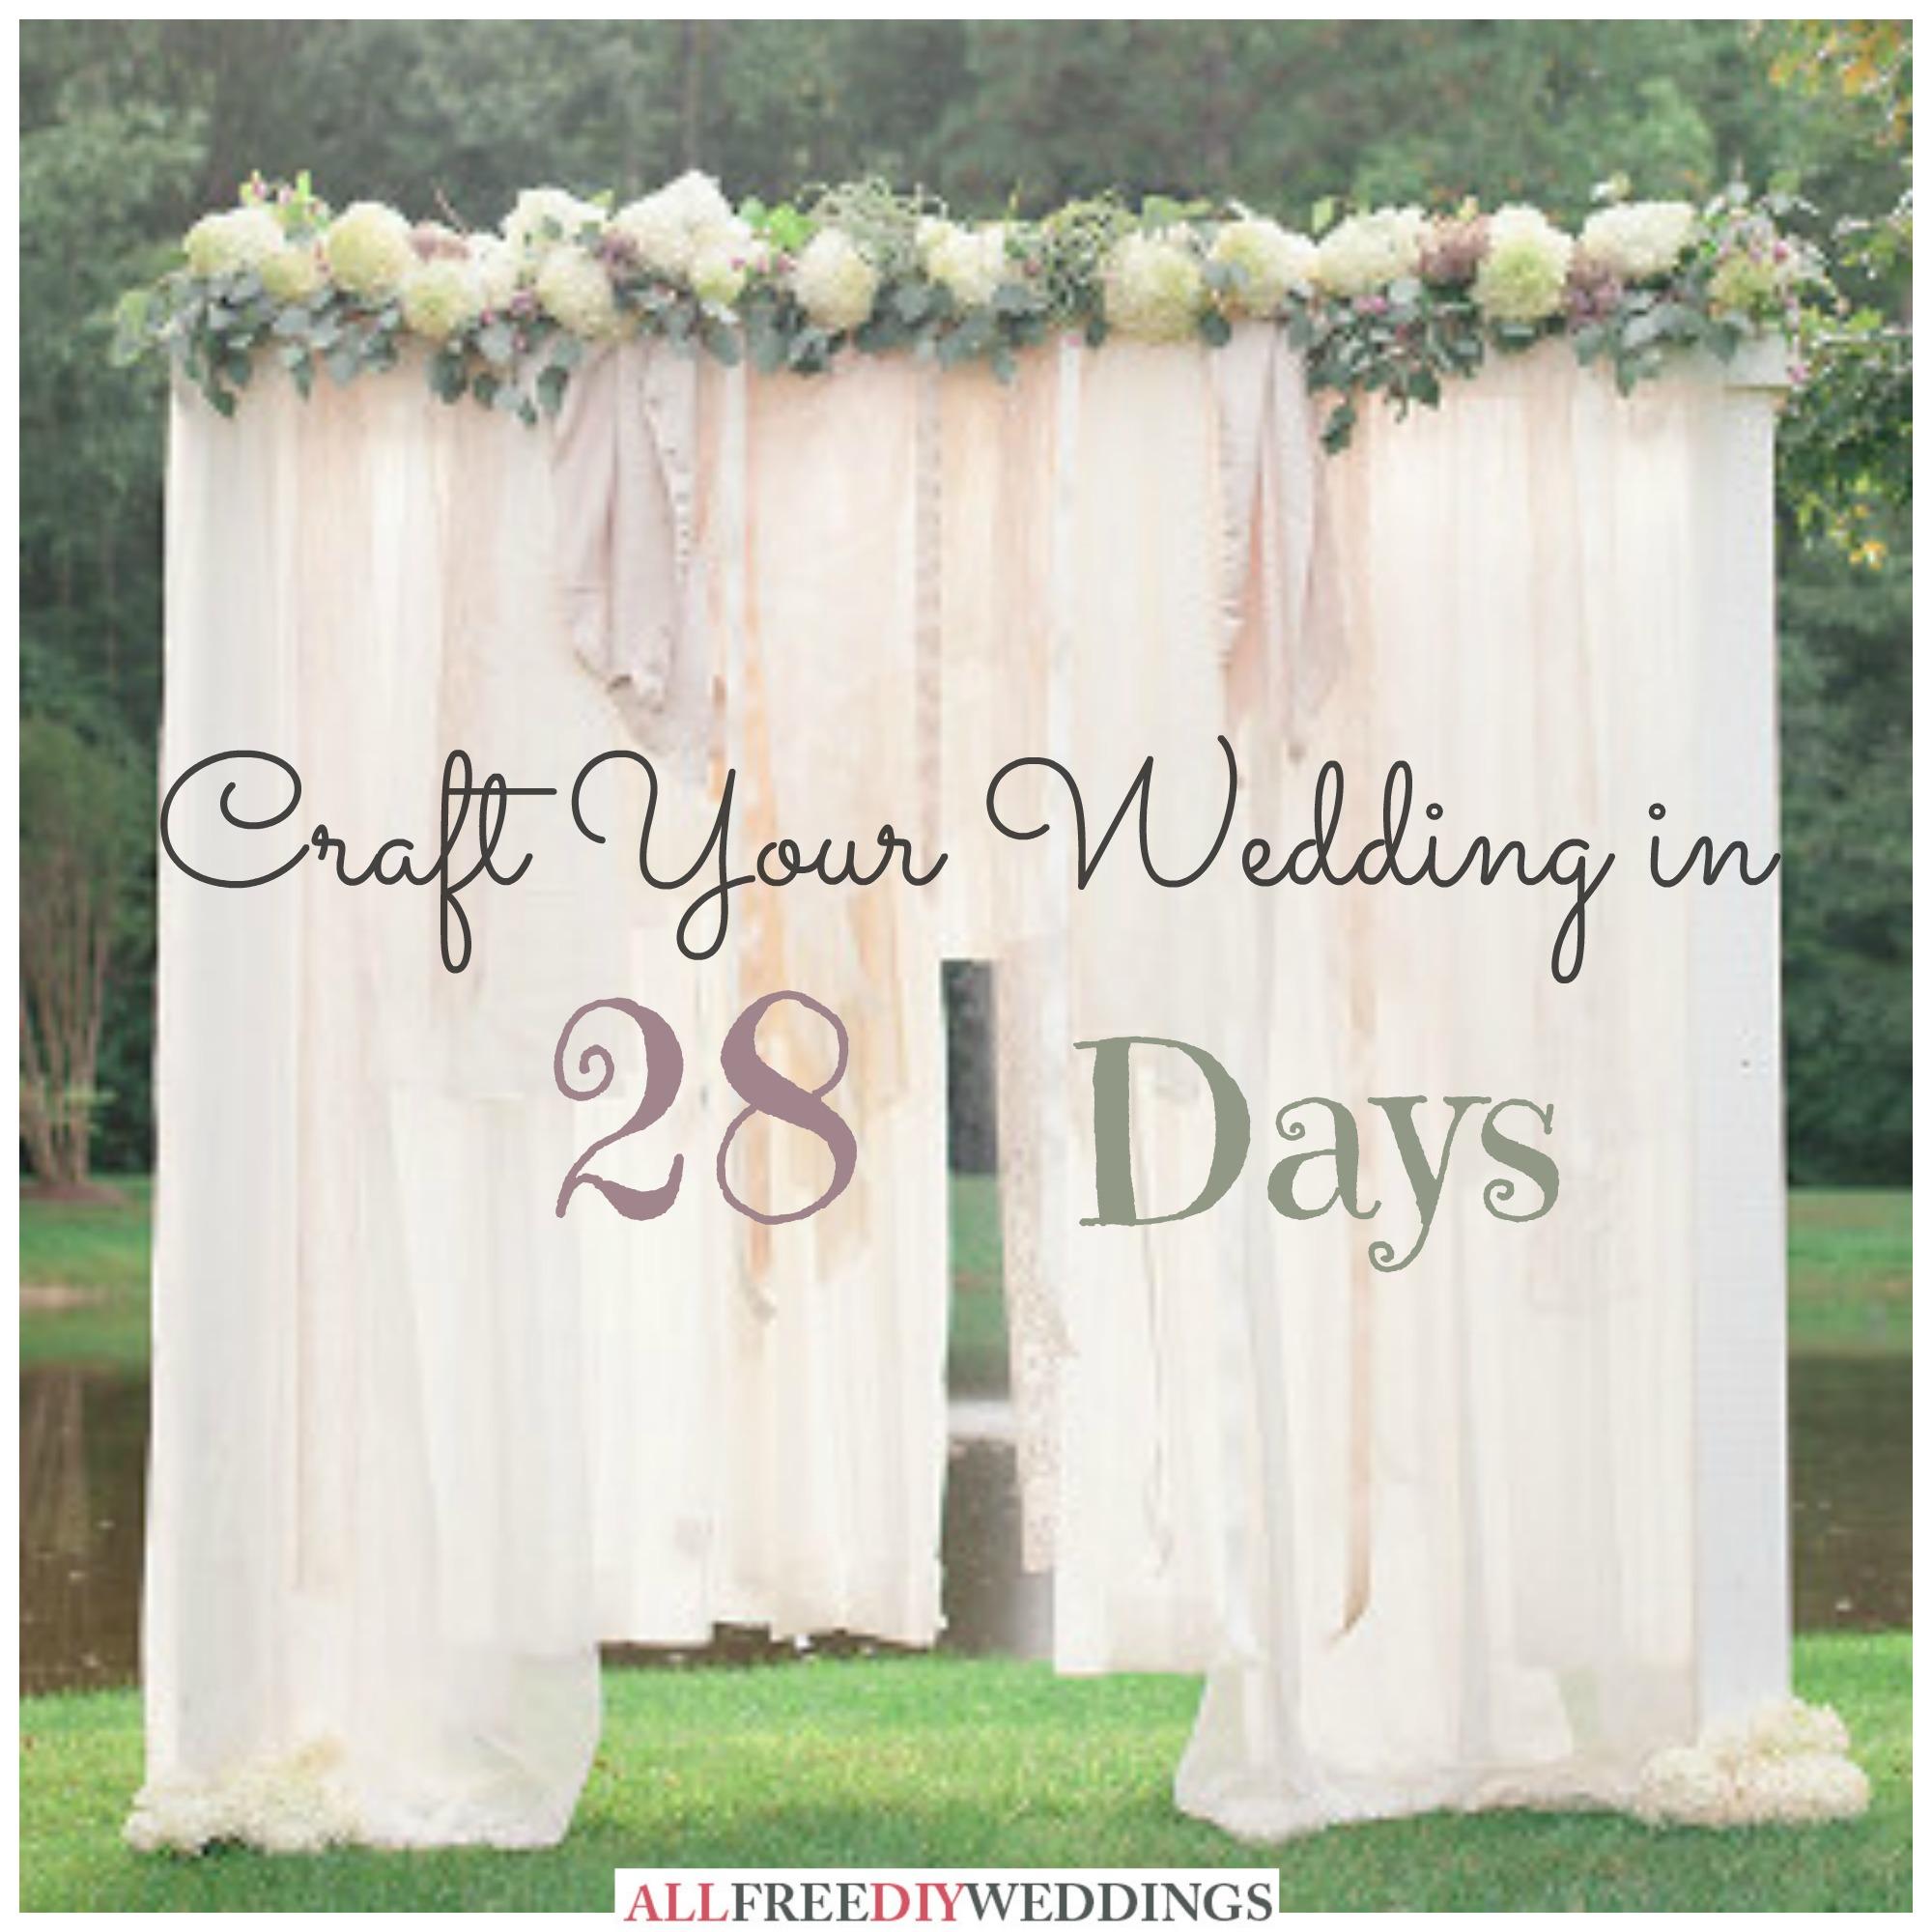 Diy Wedding Decorations: National Wedding Month: Craft Your Wedding In 28 Days